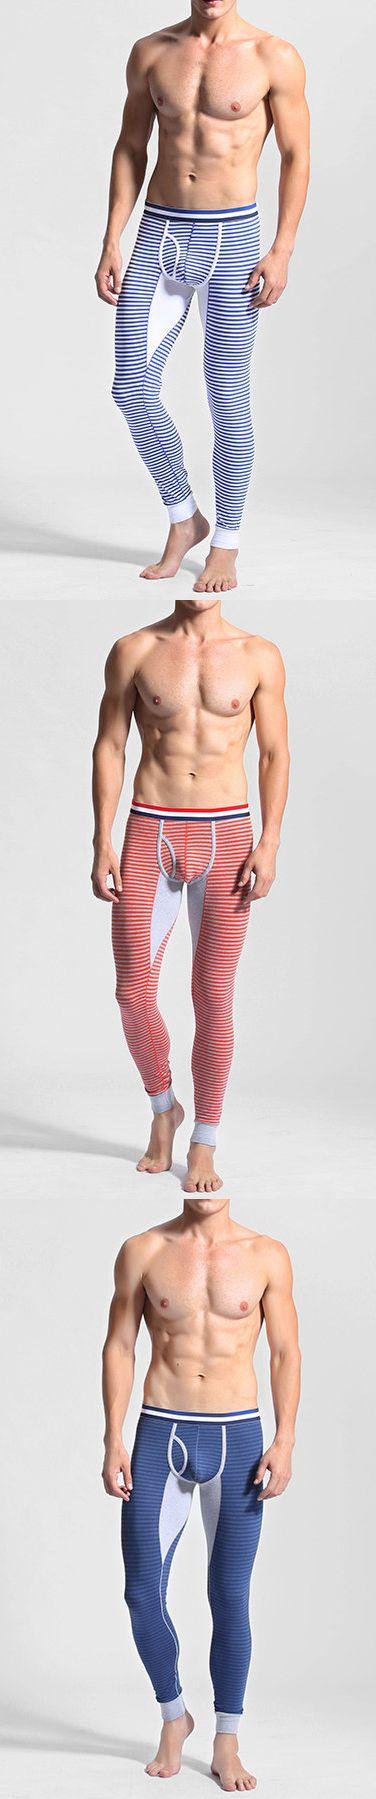 Casual Cotton Stripe Printing Slim Tight Fitting Warm Leggings for Men